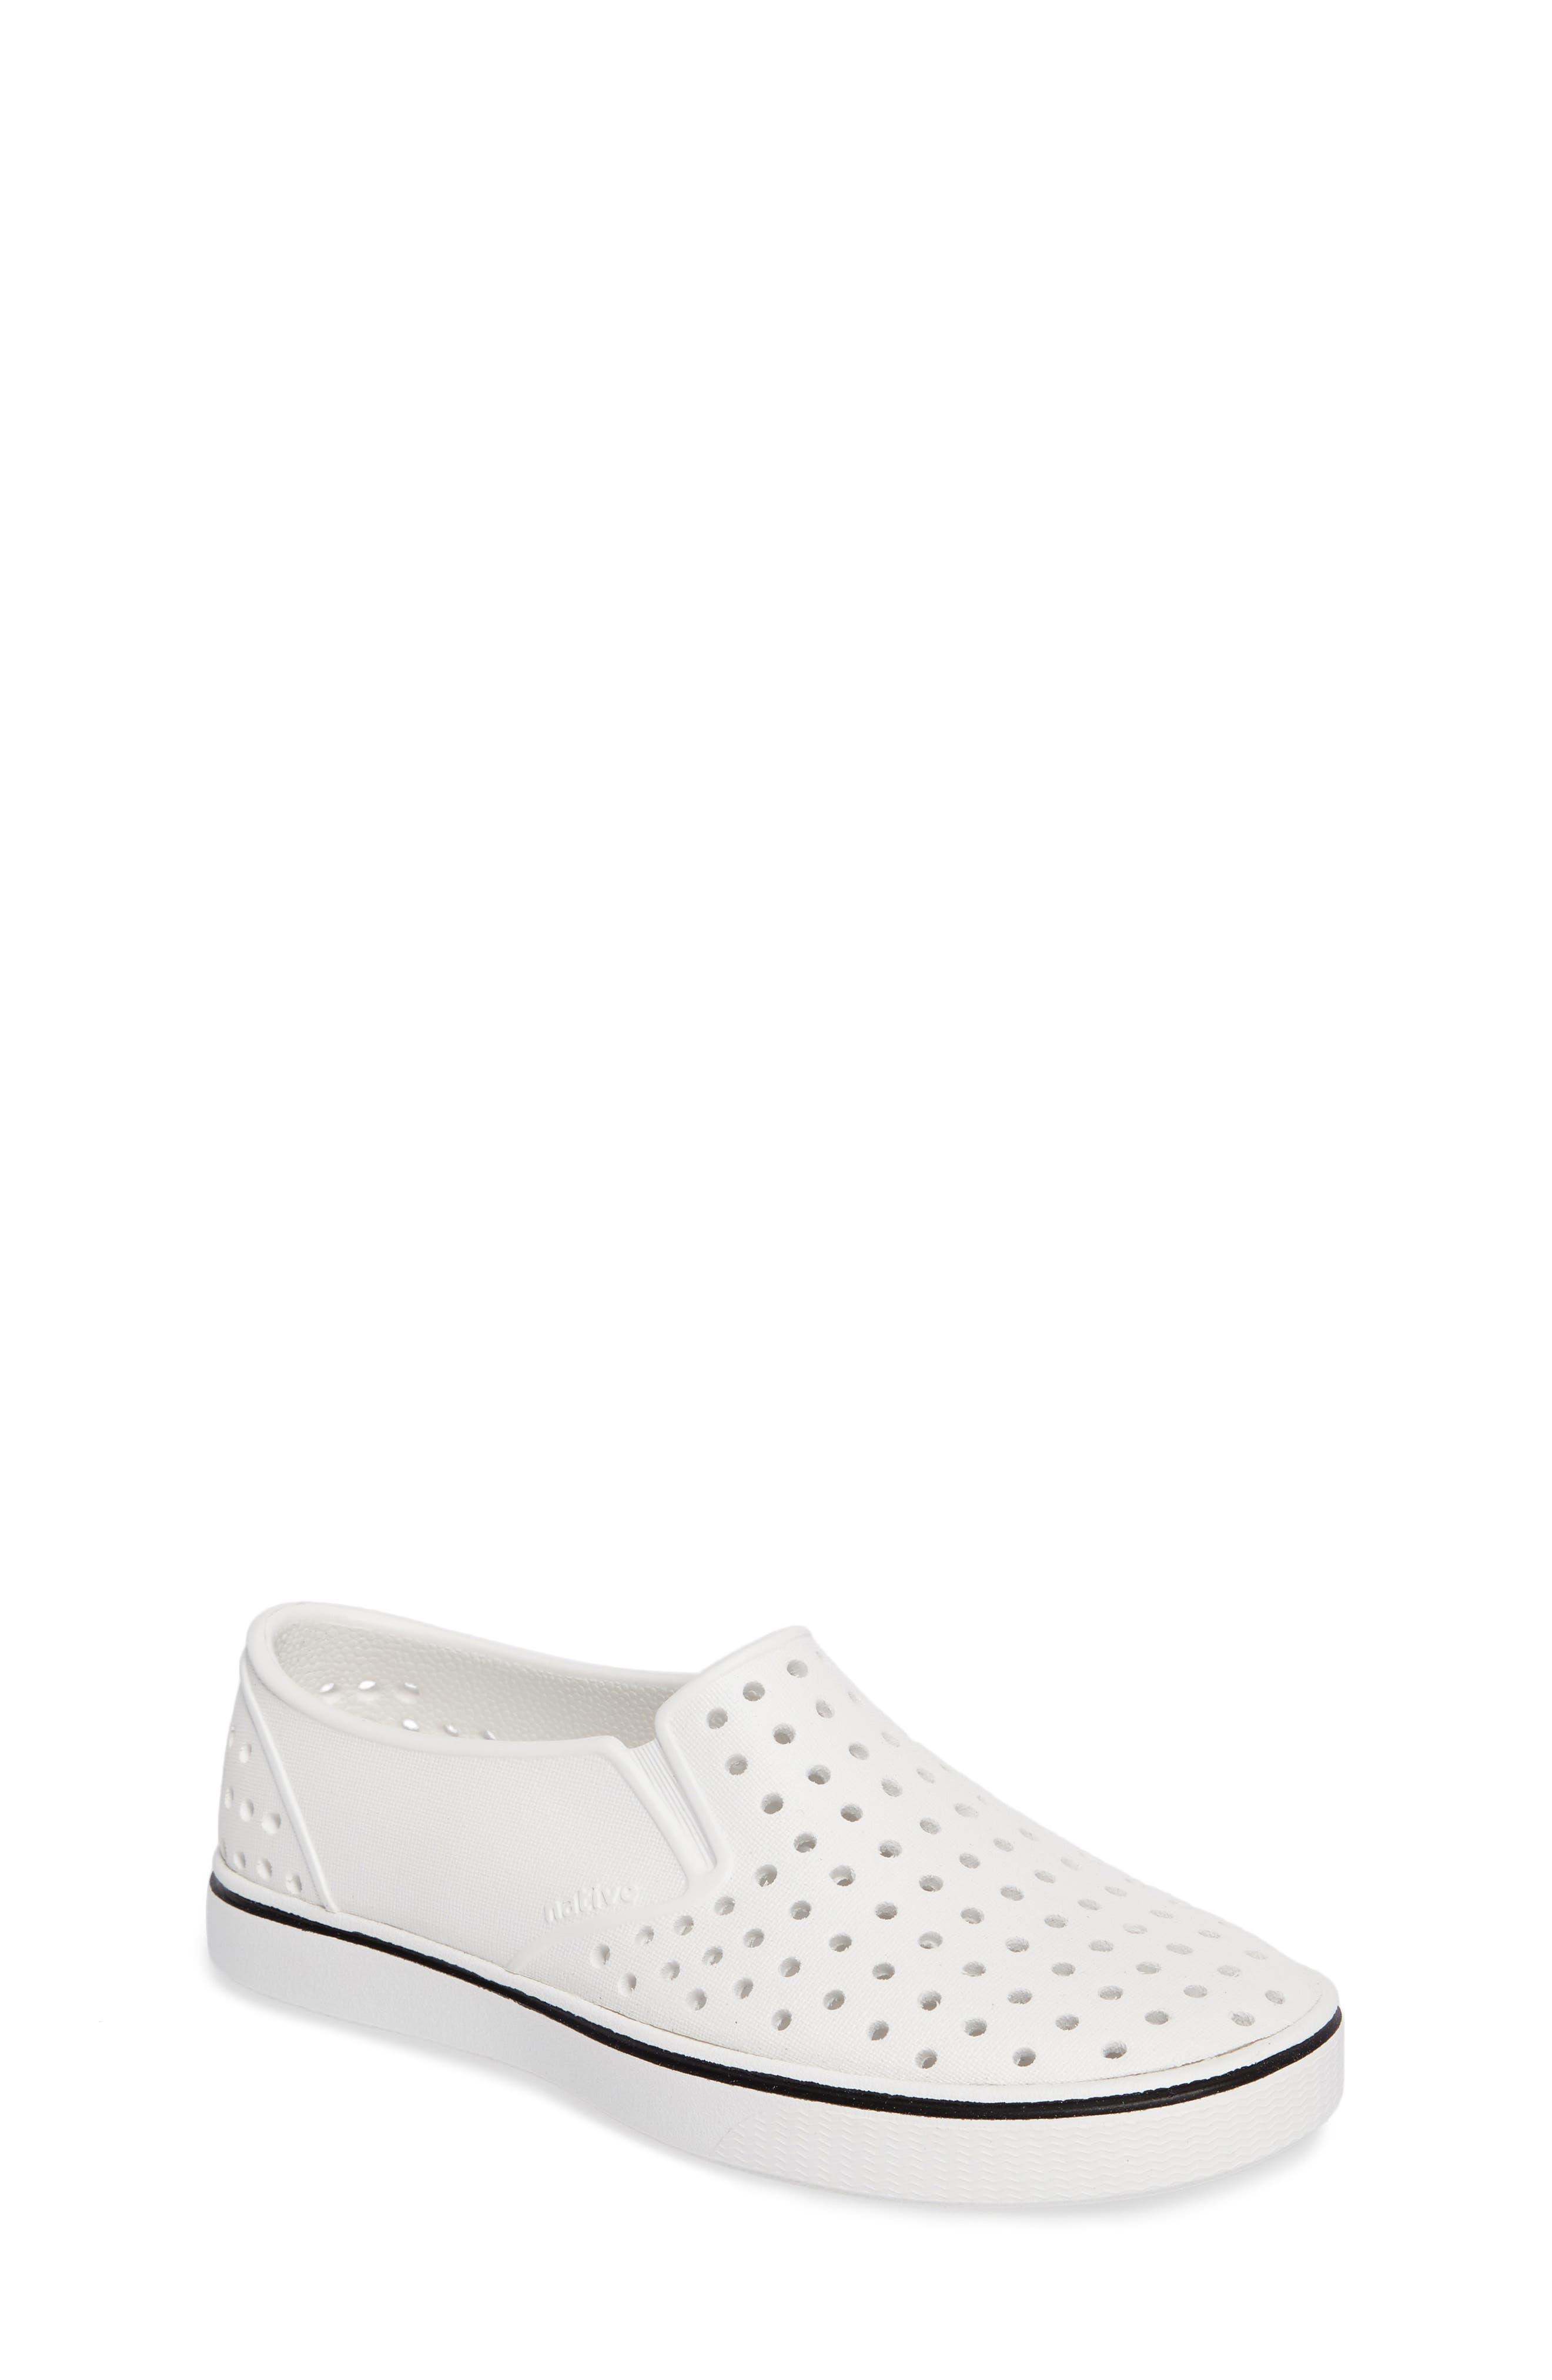 Miles Water Friendly Slip-On Sneaker,                         Main,                         color, SHELL WHITE